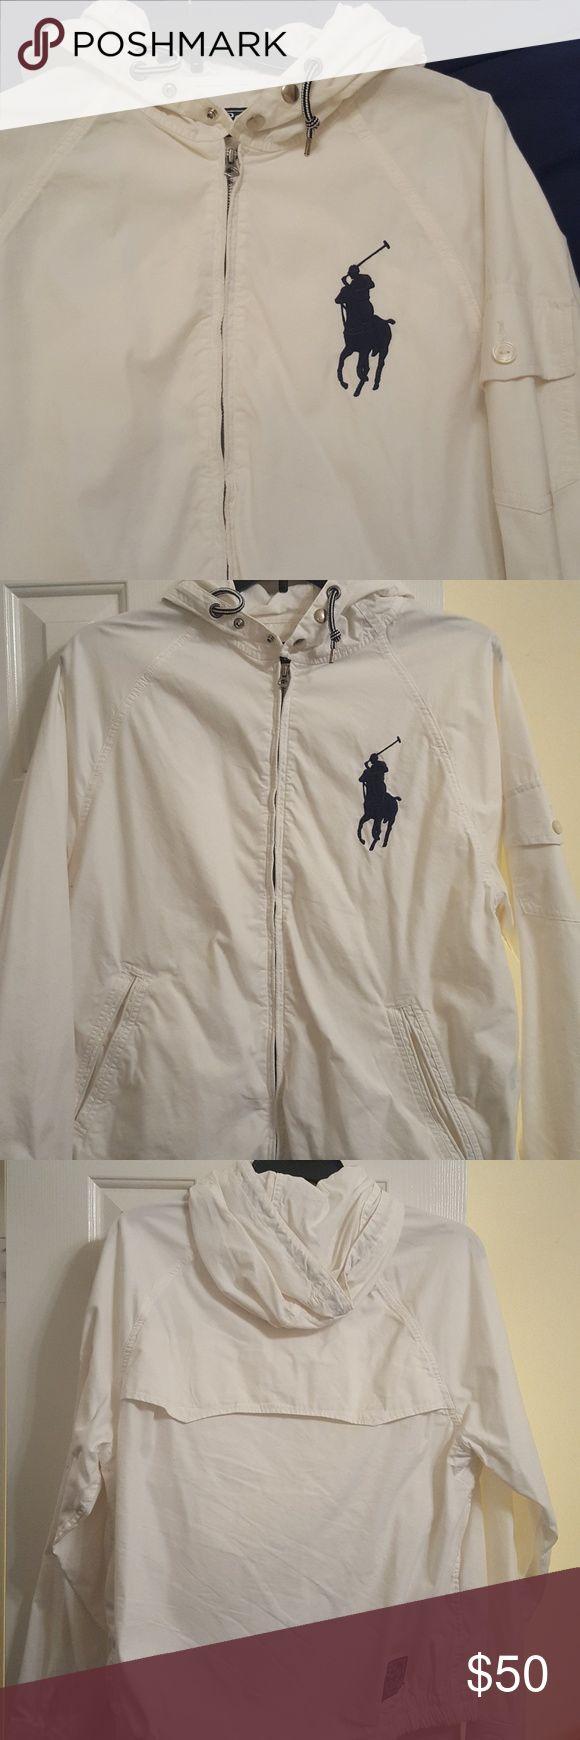 Casual Polo Jacket Light casual jacket. It has a dress shirt feel to it. Metal zippers. Ralph Lauren Blue Label Jackets & Coats Lightweight & Shirt Jackets